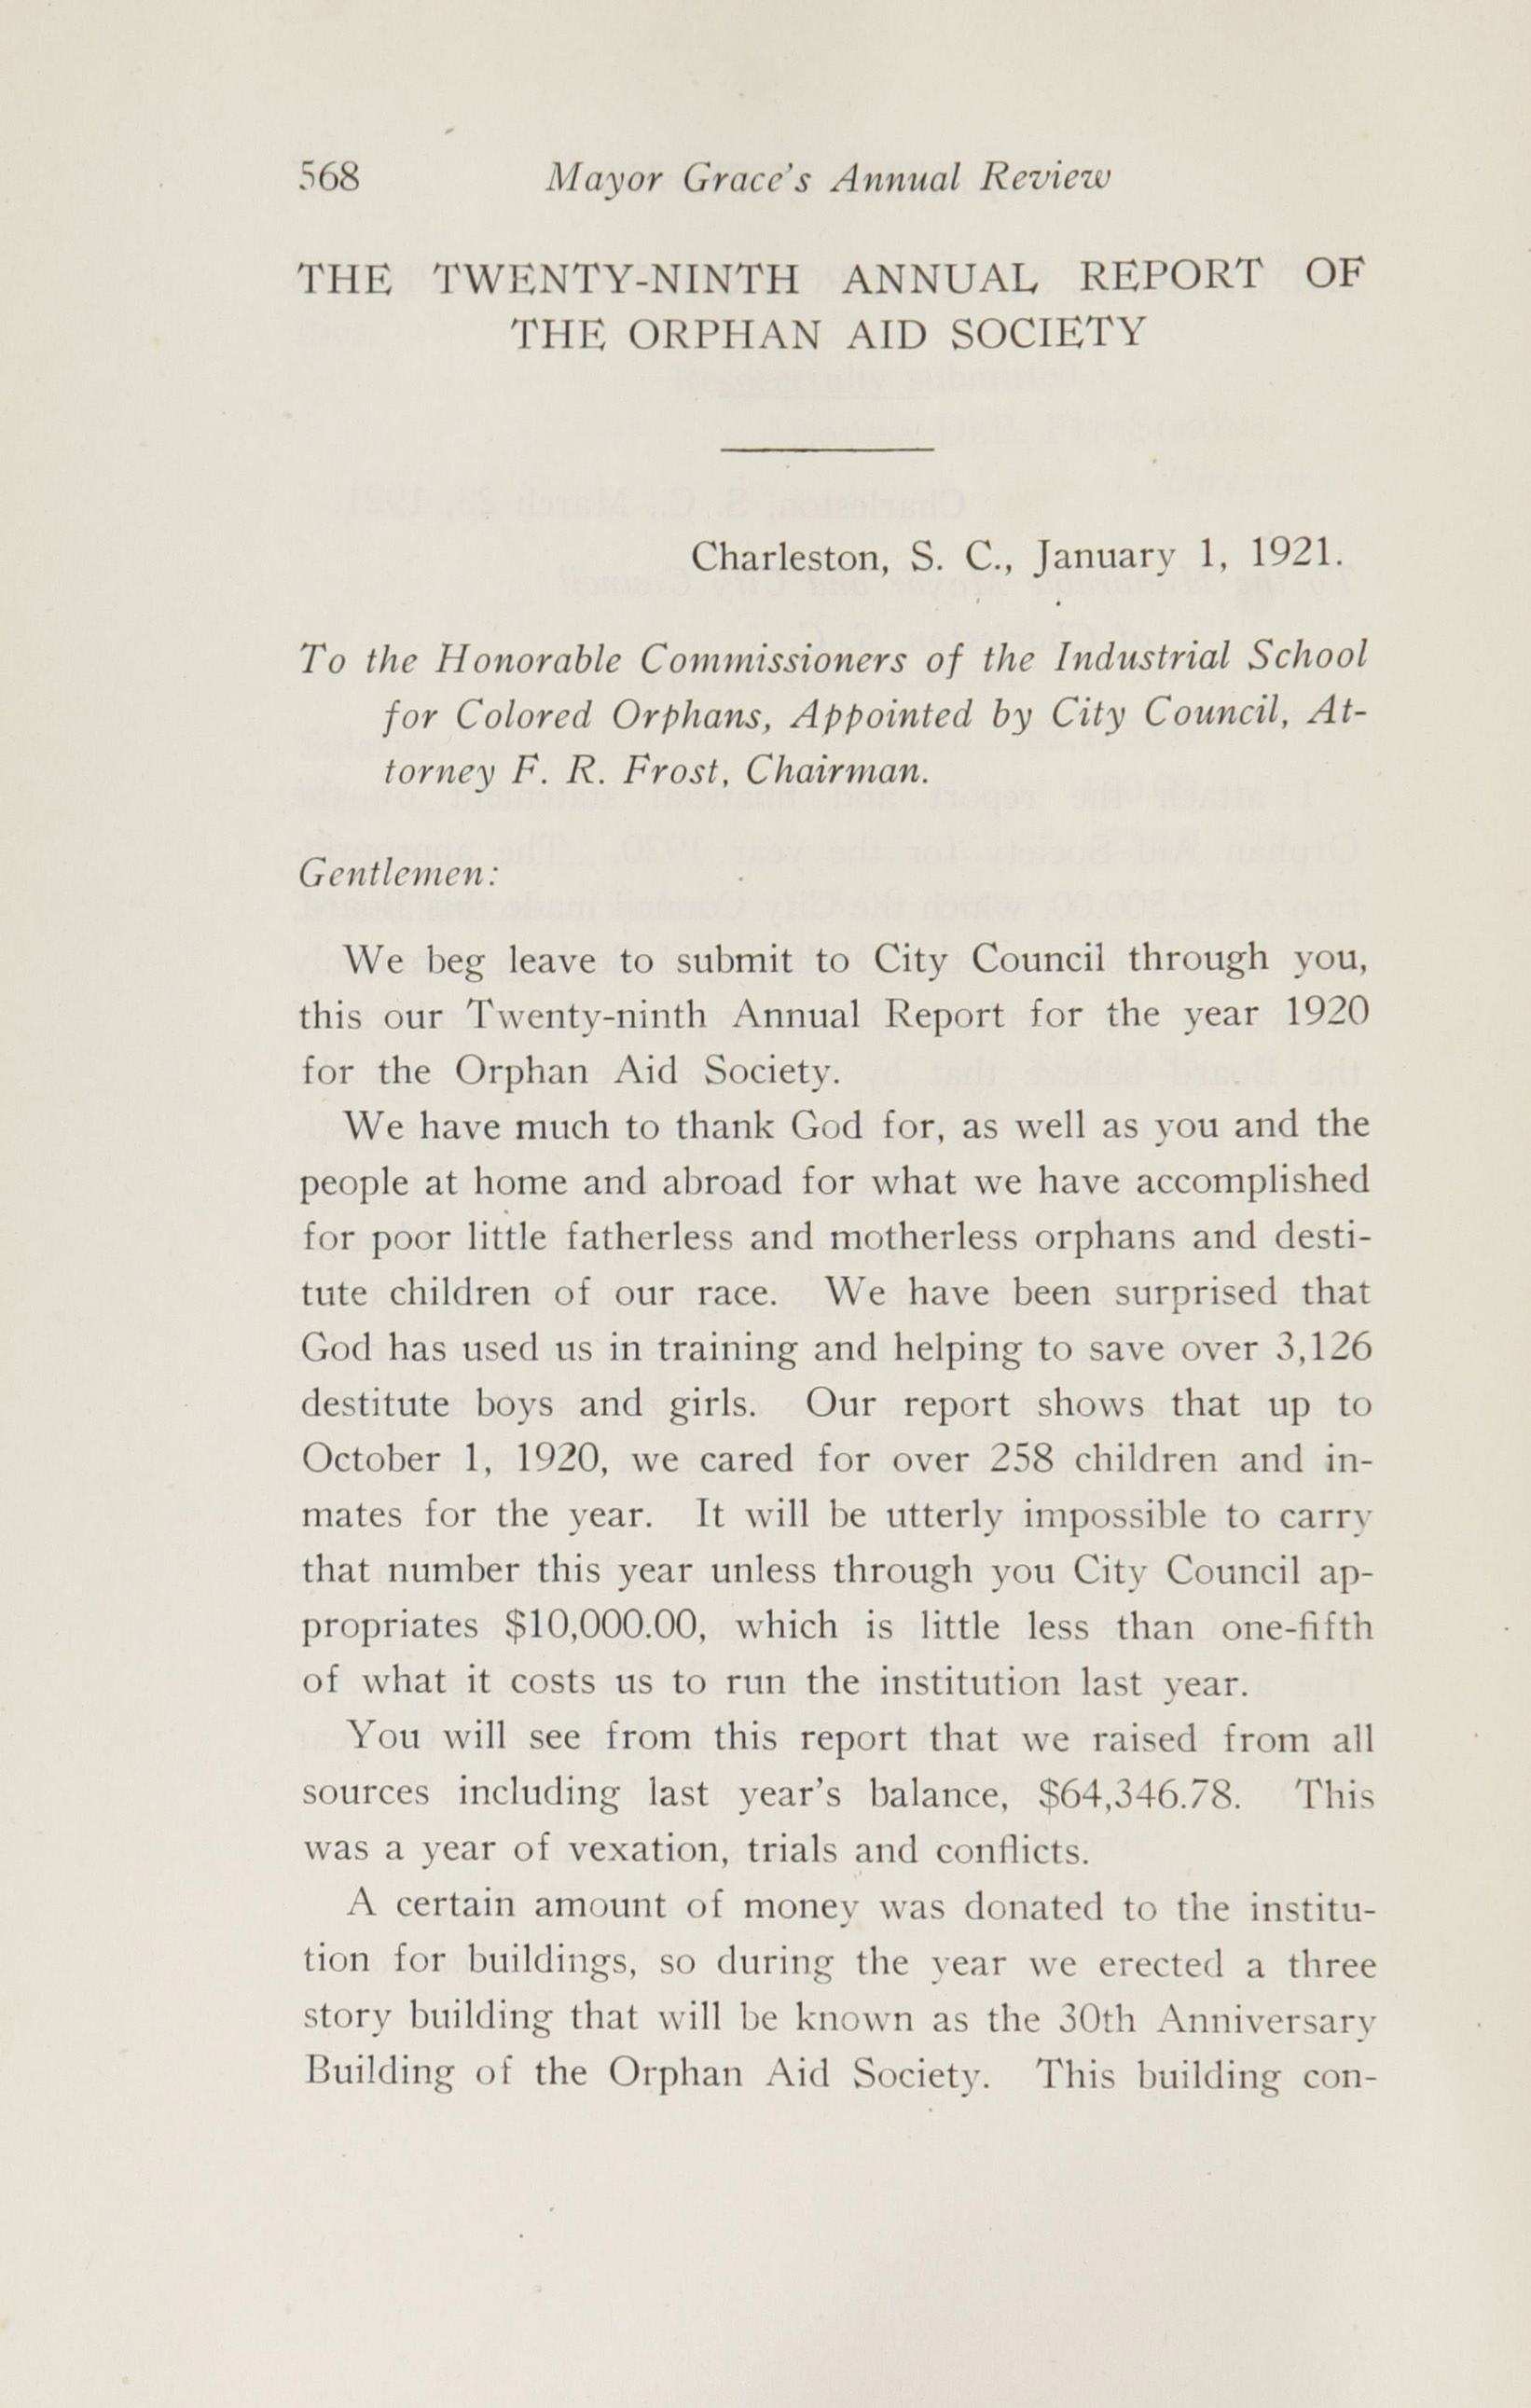 Charleston Yearbook, 1920, page 568